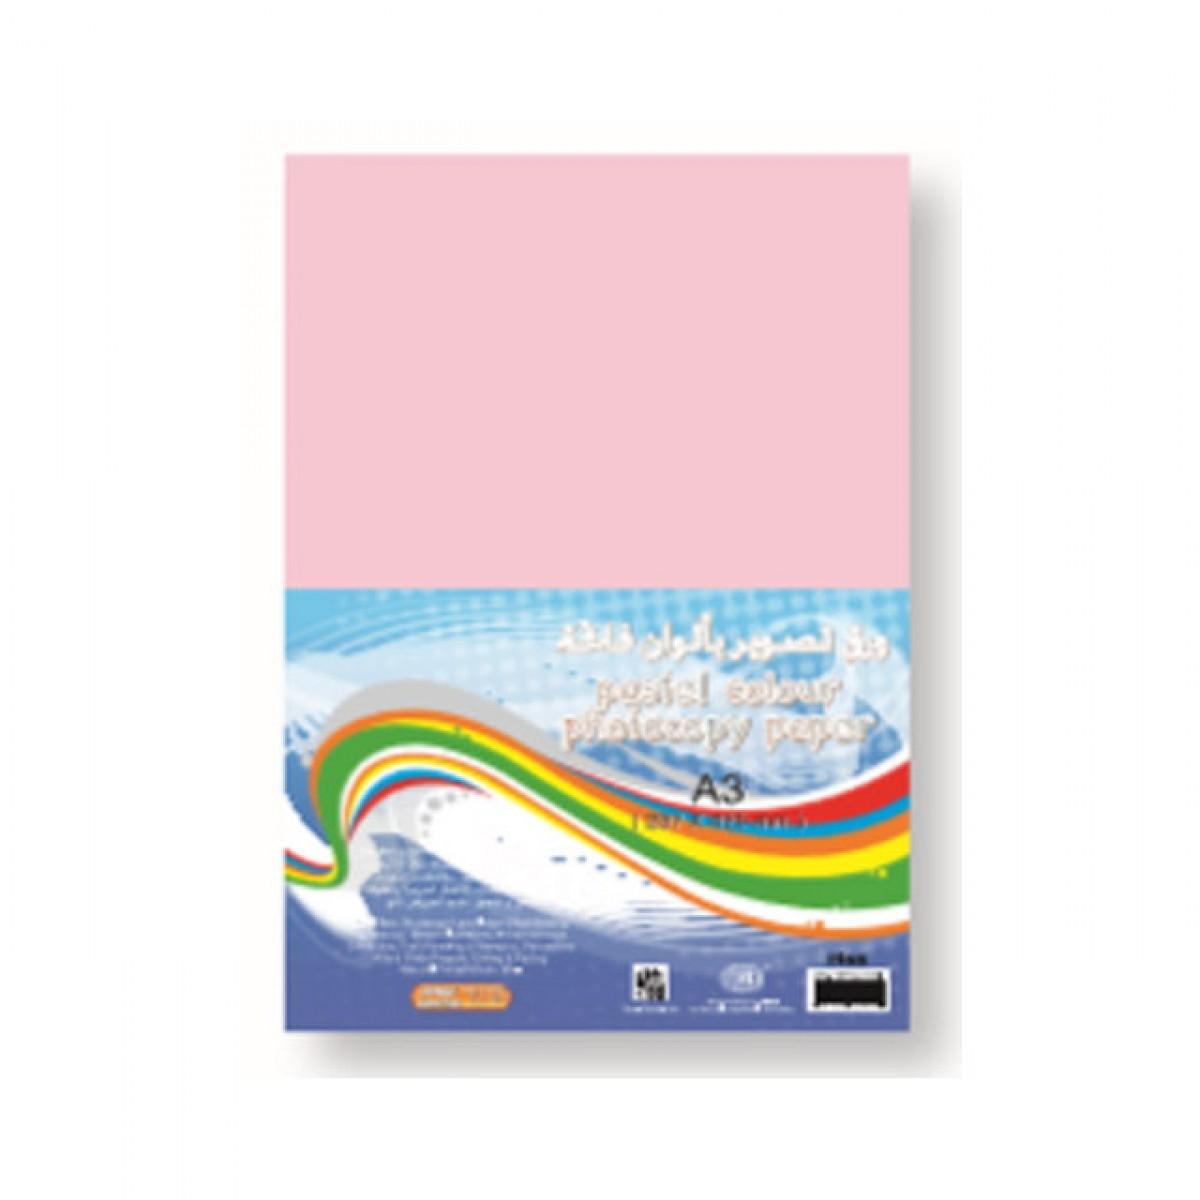 FIS Pastel Color Photocopy Paper A3 80gsm FSPWA3100PI - Pastel Pink (pkt/100s)